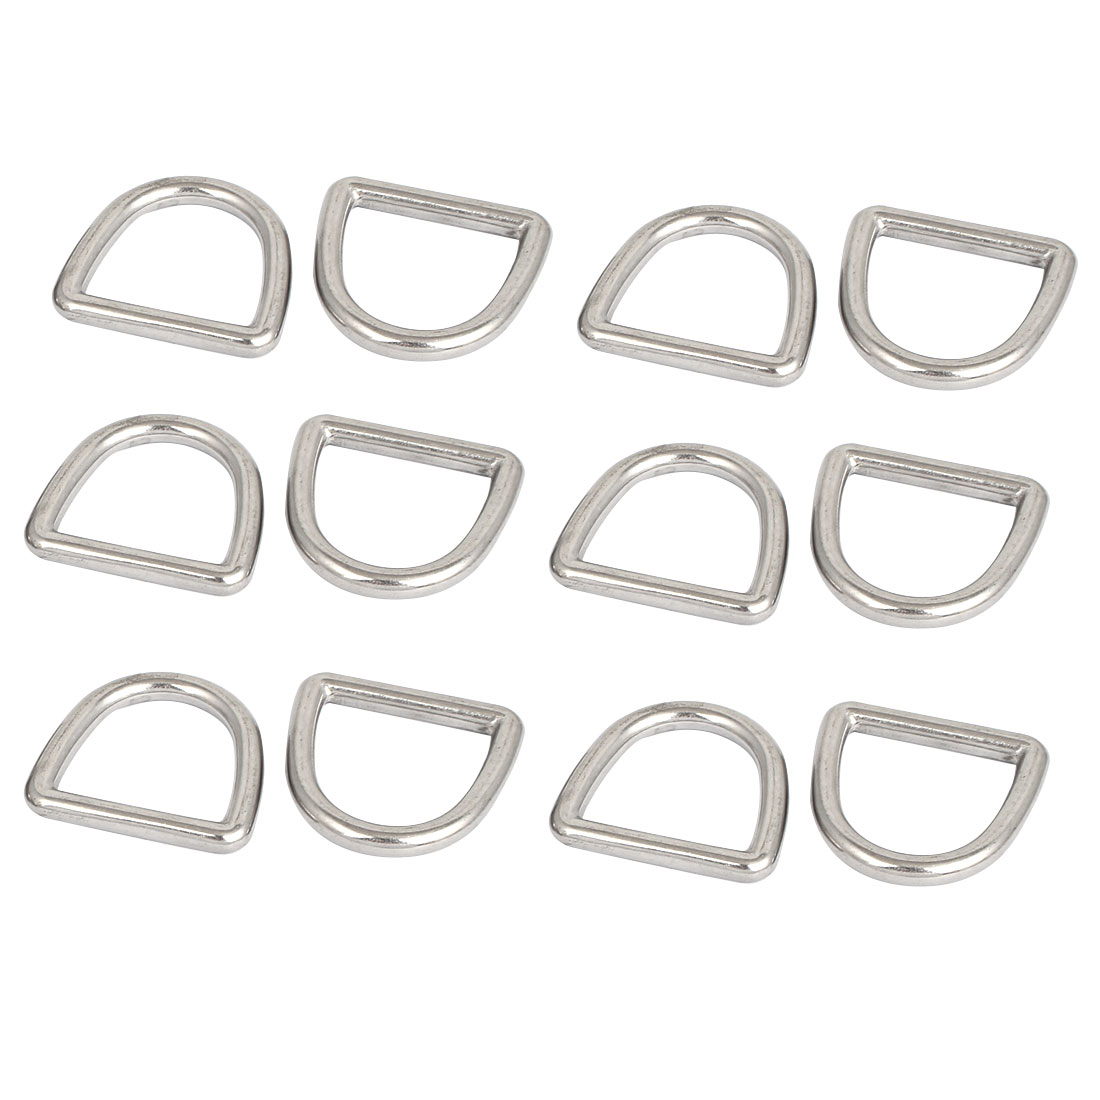 Stainless Steel D Ring Hooks D-Shaped Buckles Handbag Belt Buckle 12 Pcs